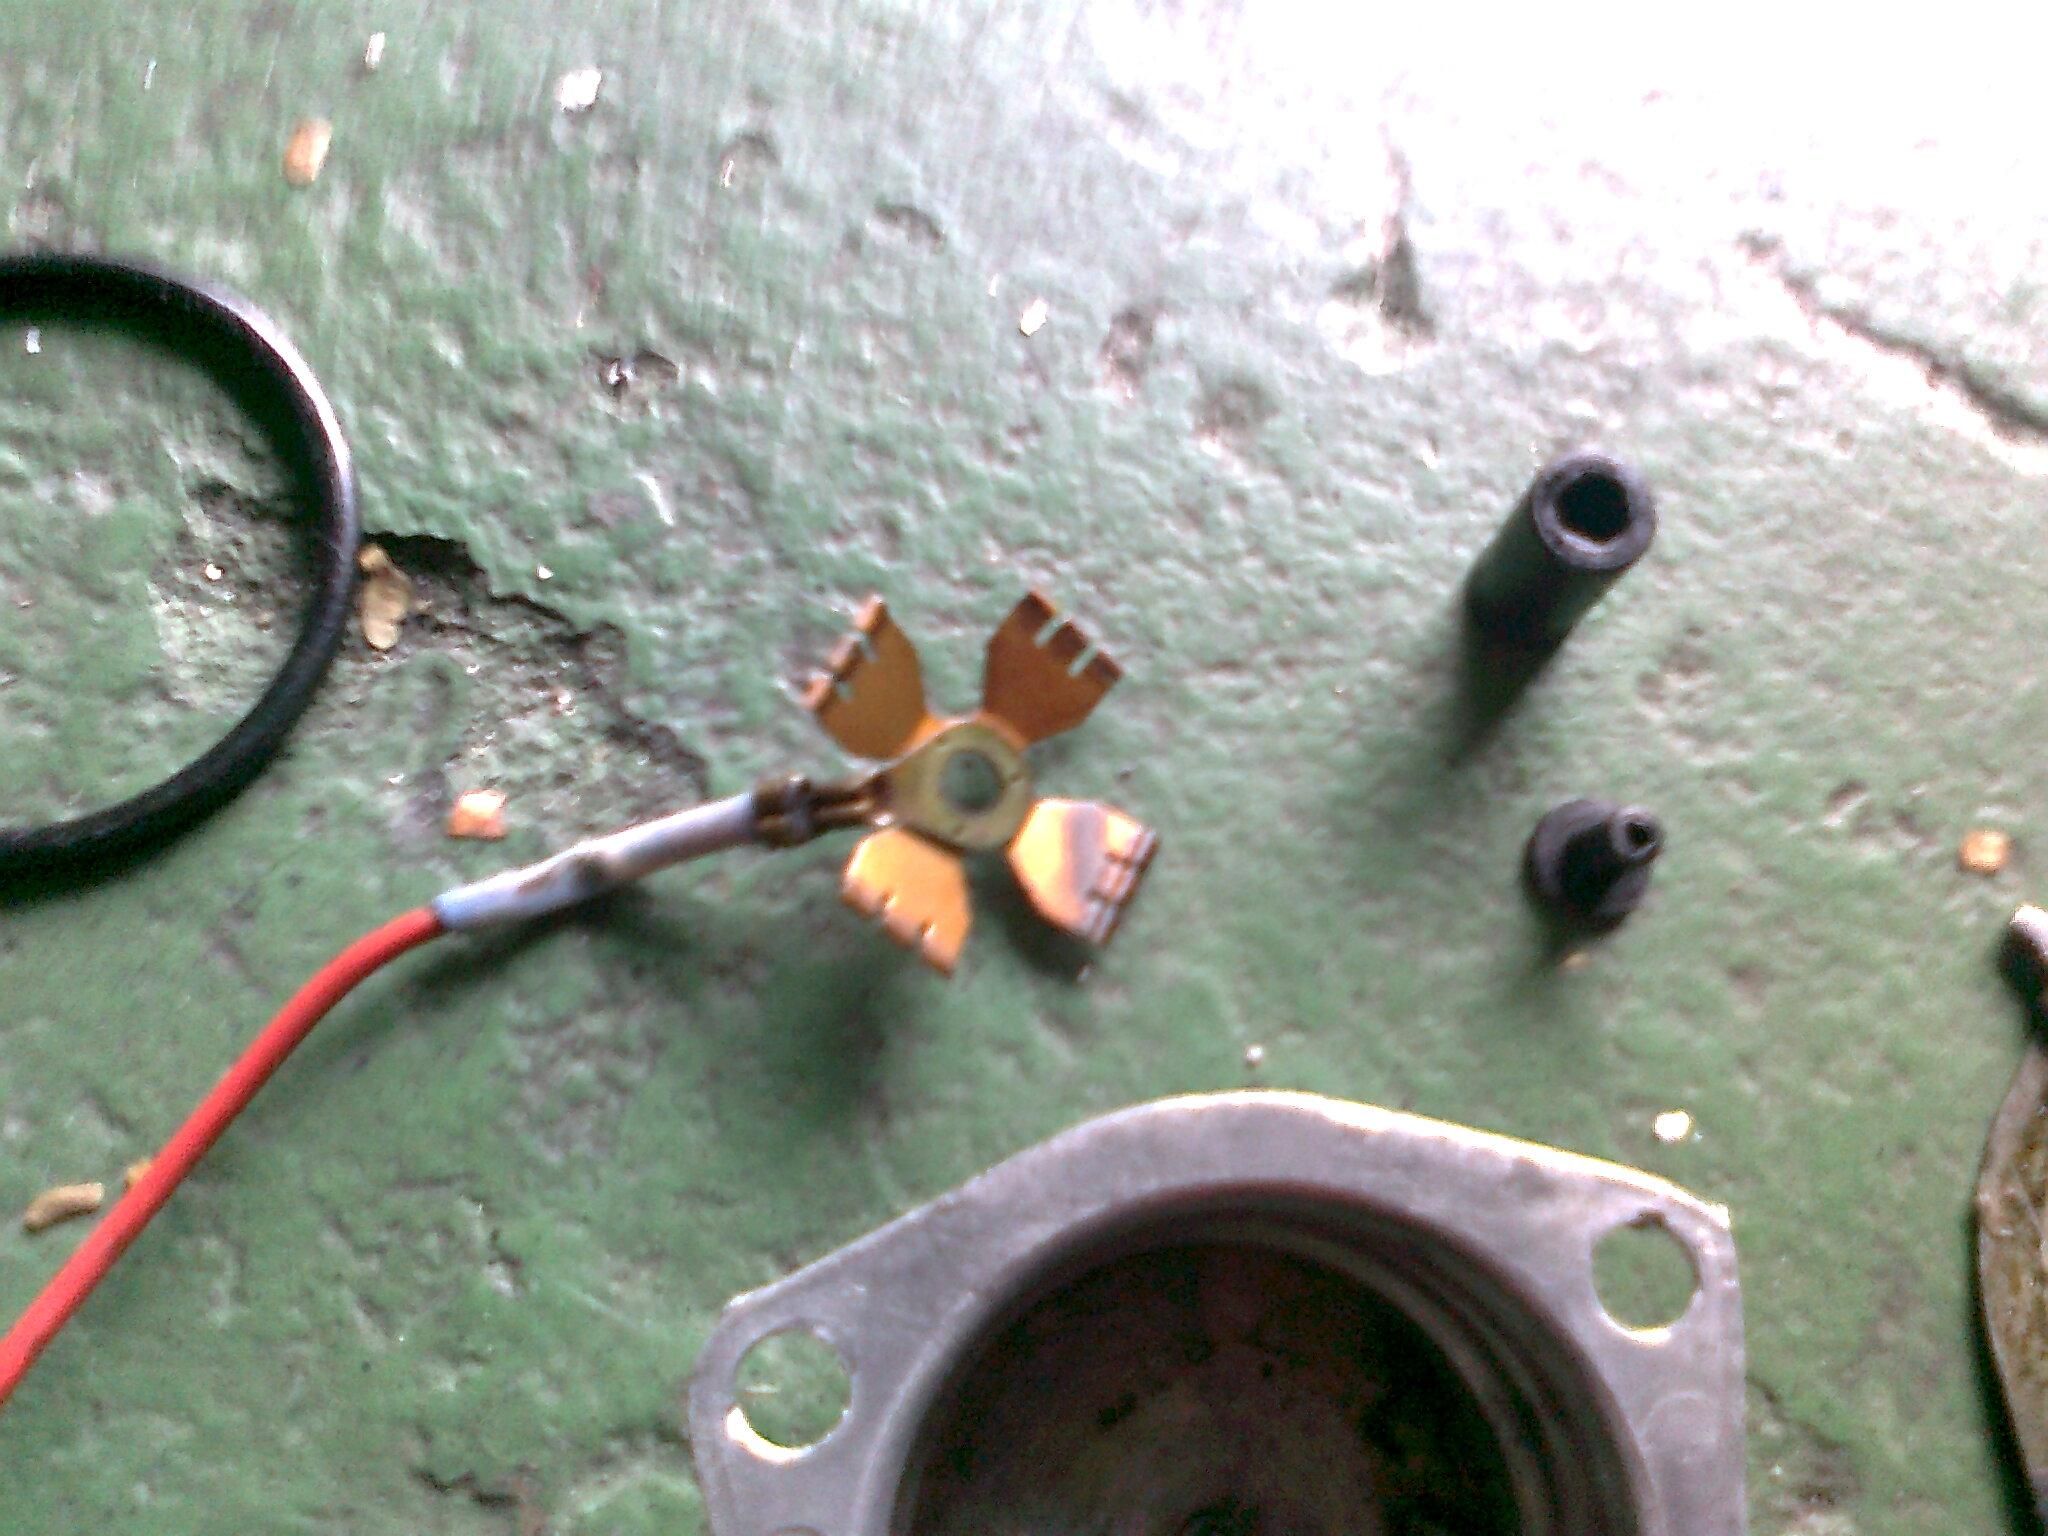 pré aquecedor de combustivel no coletor de admissao monza alcool (ptc) 29x7a9